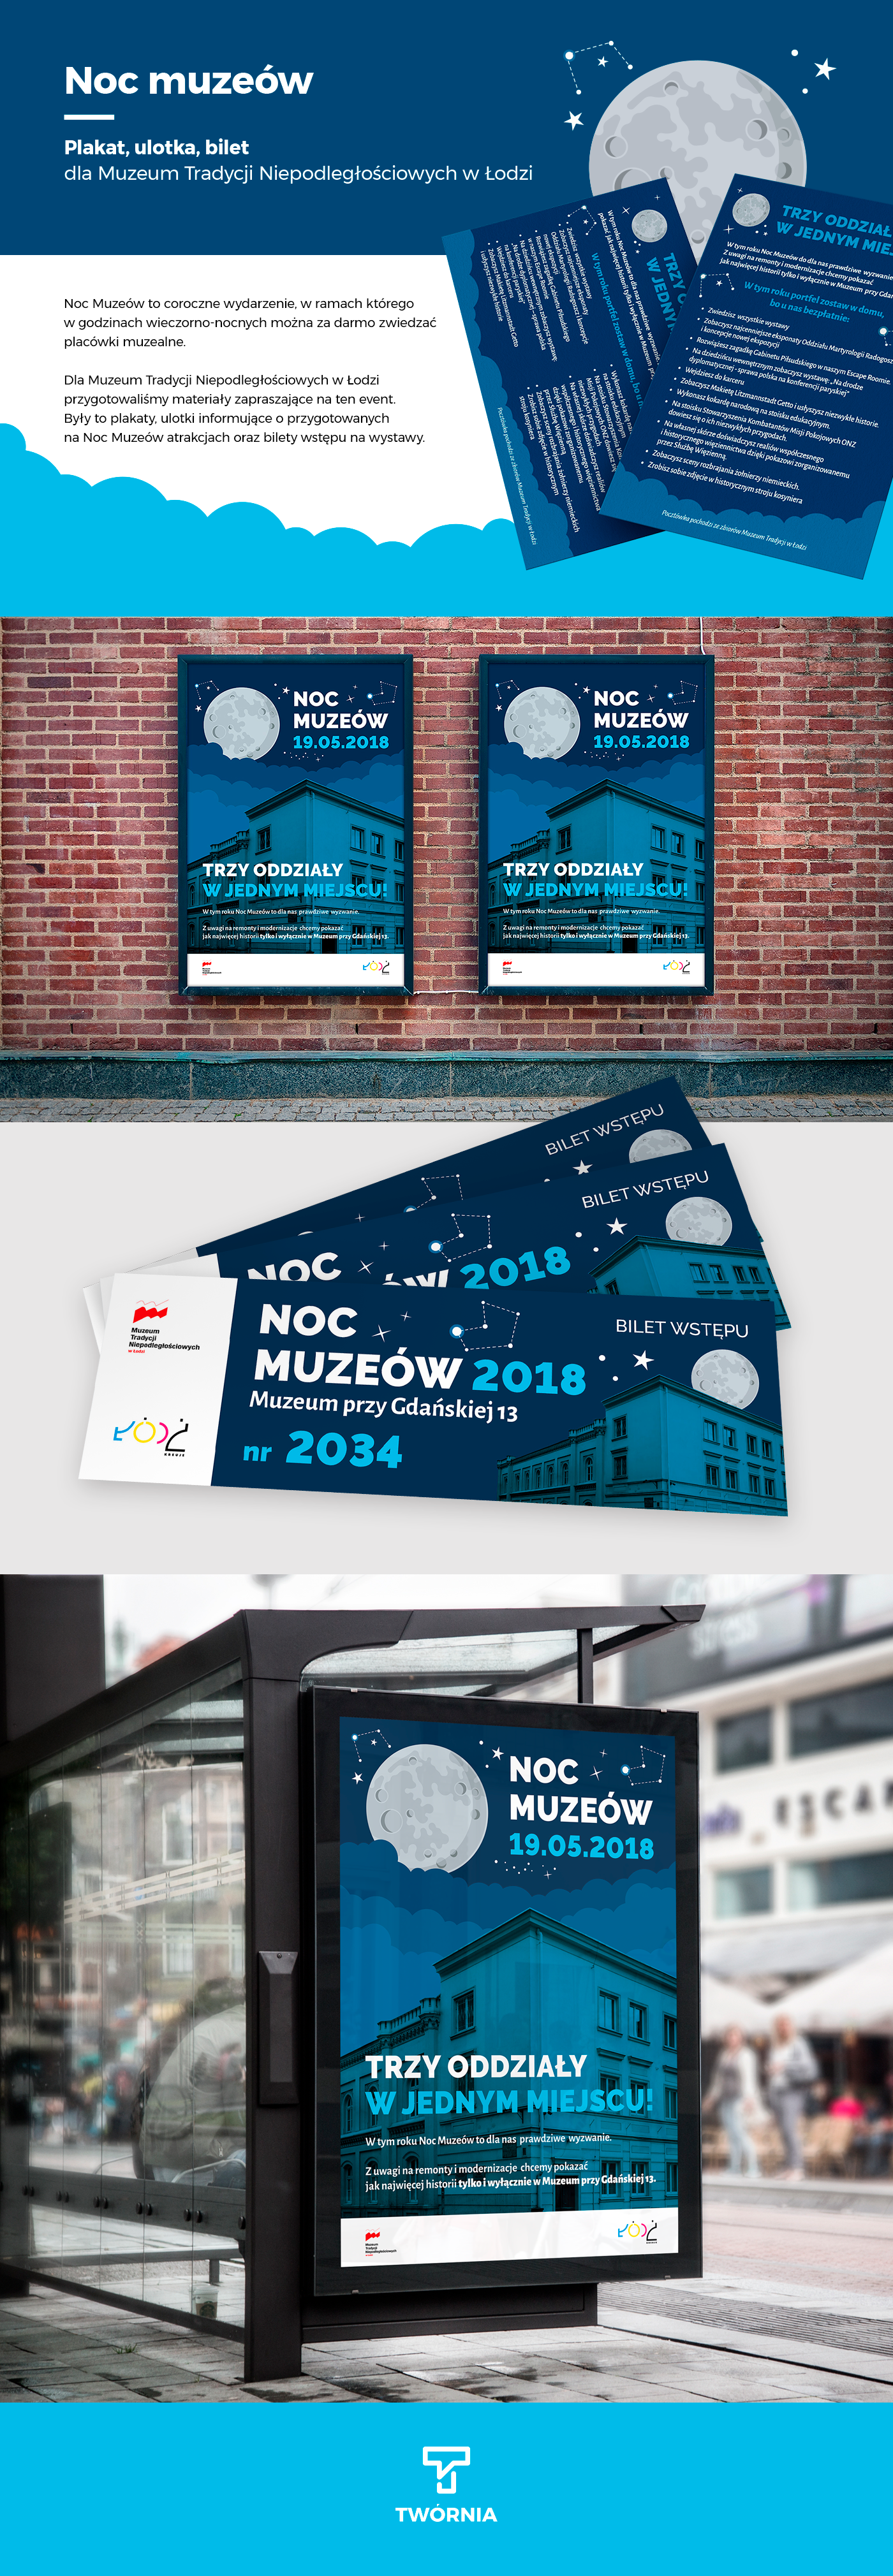 poster ticket leafleat plakaty Ulotki bilety muzeum museum